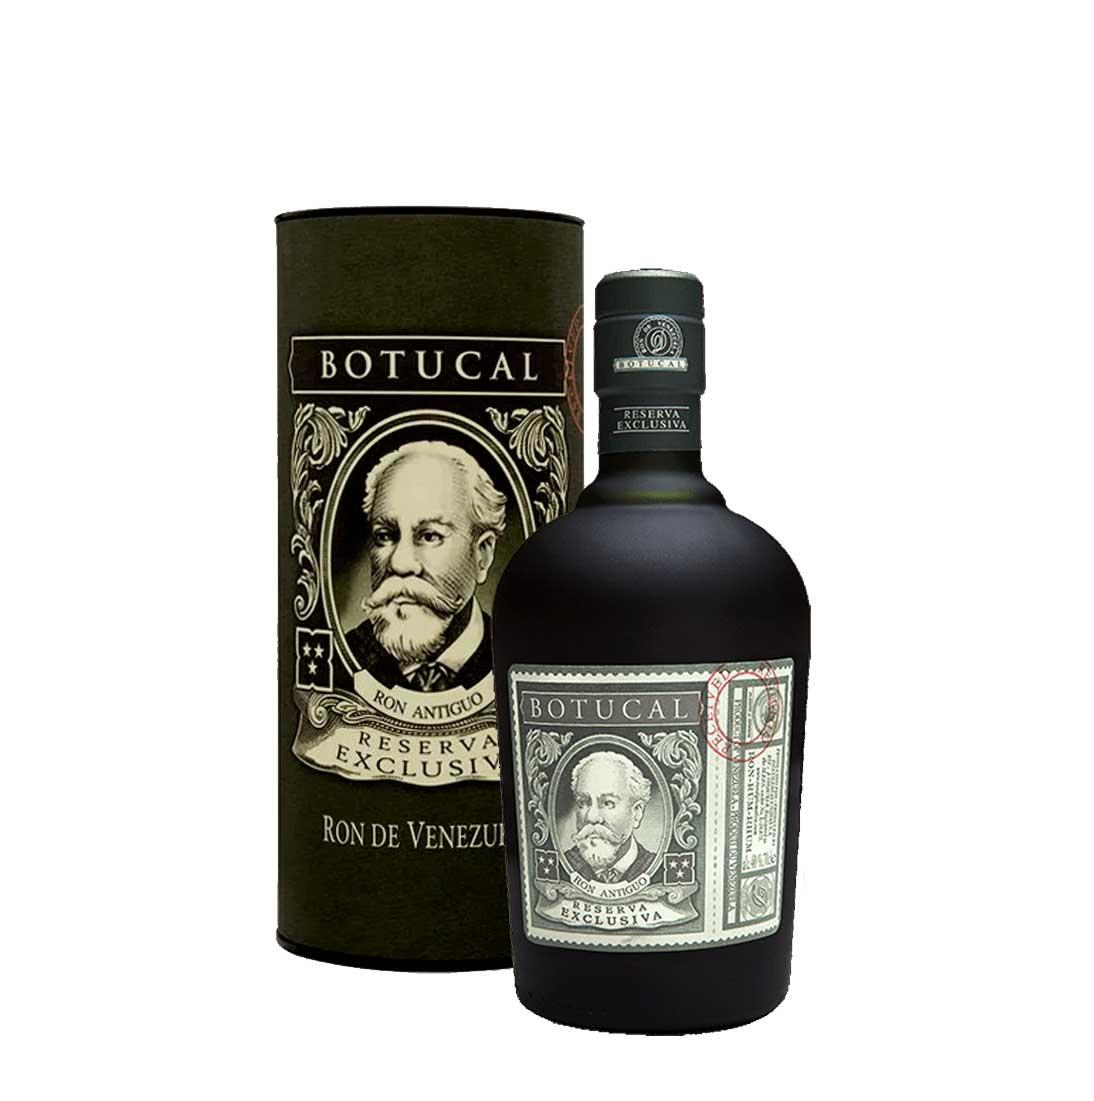 Botucal Reserva Exclusiva Rum mit Geschenkverpackung 0,70l (40% Vol) Ron de Venezuela - [Enthält Sulfite]